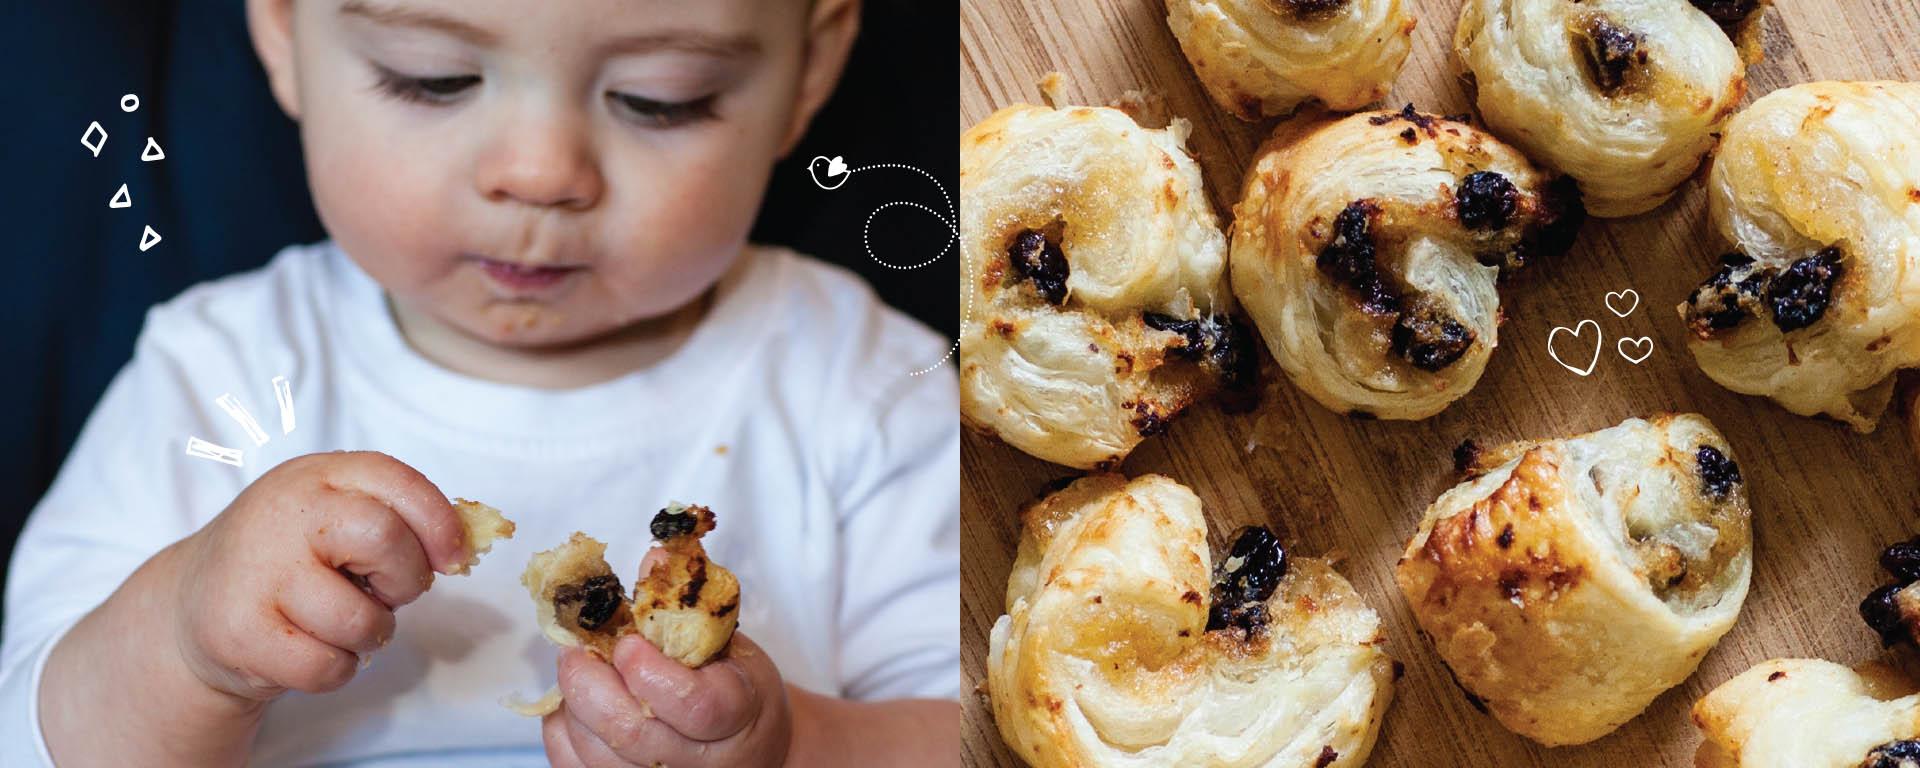 Baby Led Feeding Branding and website for new food startup Irish company Irish Food Blogger Design Website Footer Design